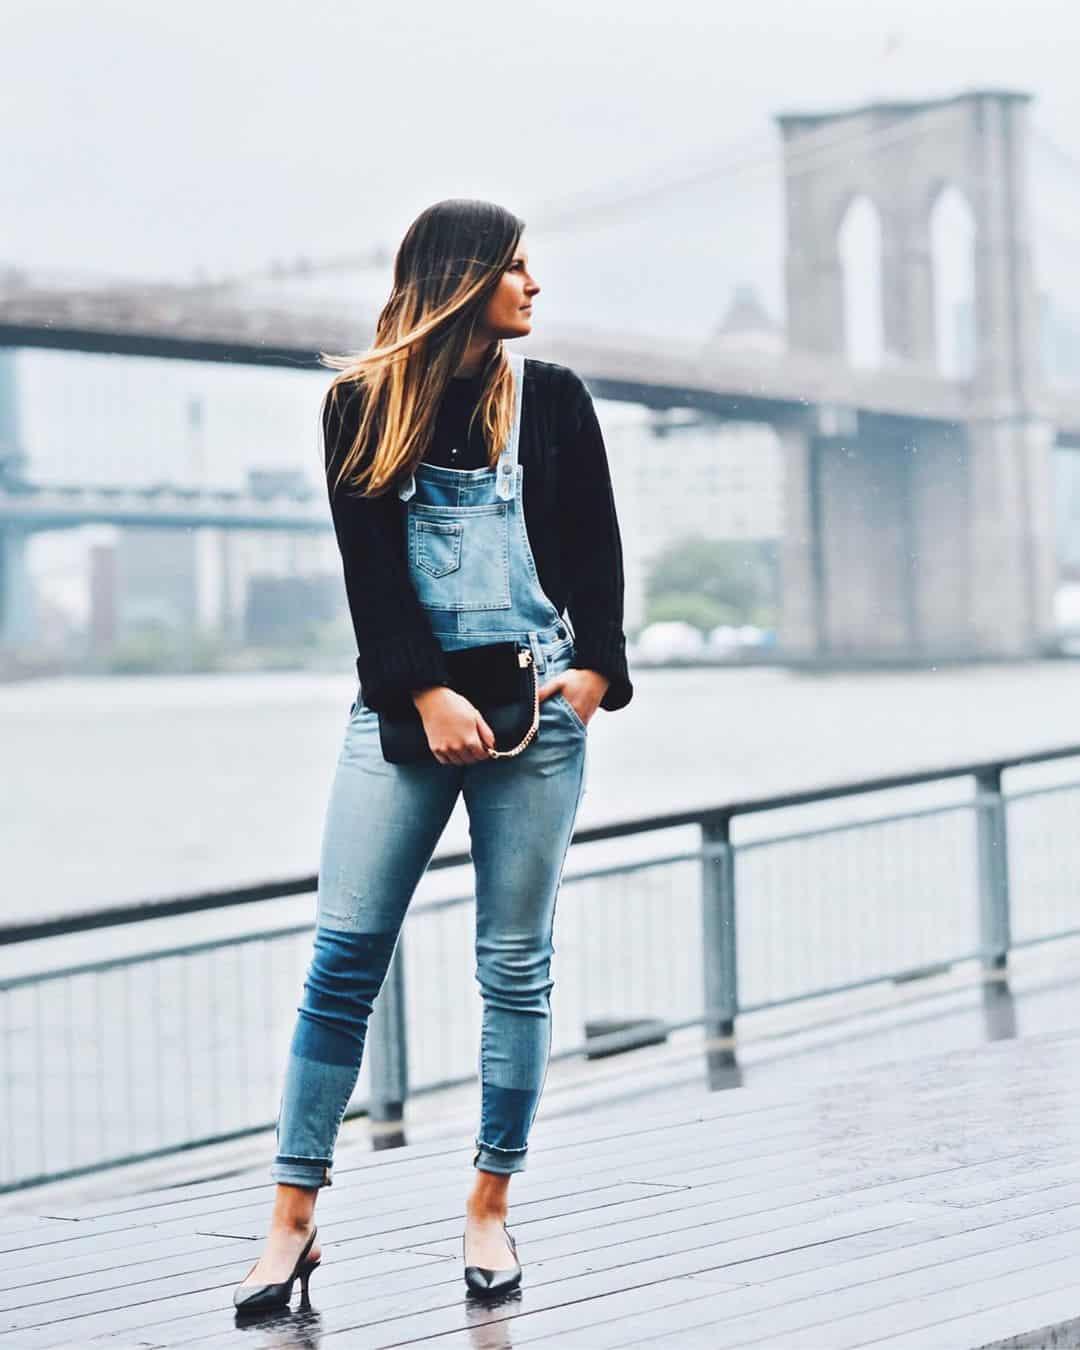 Lace and velvet dress pants for women 2022